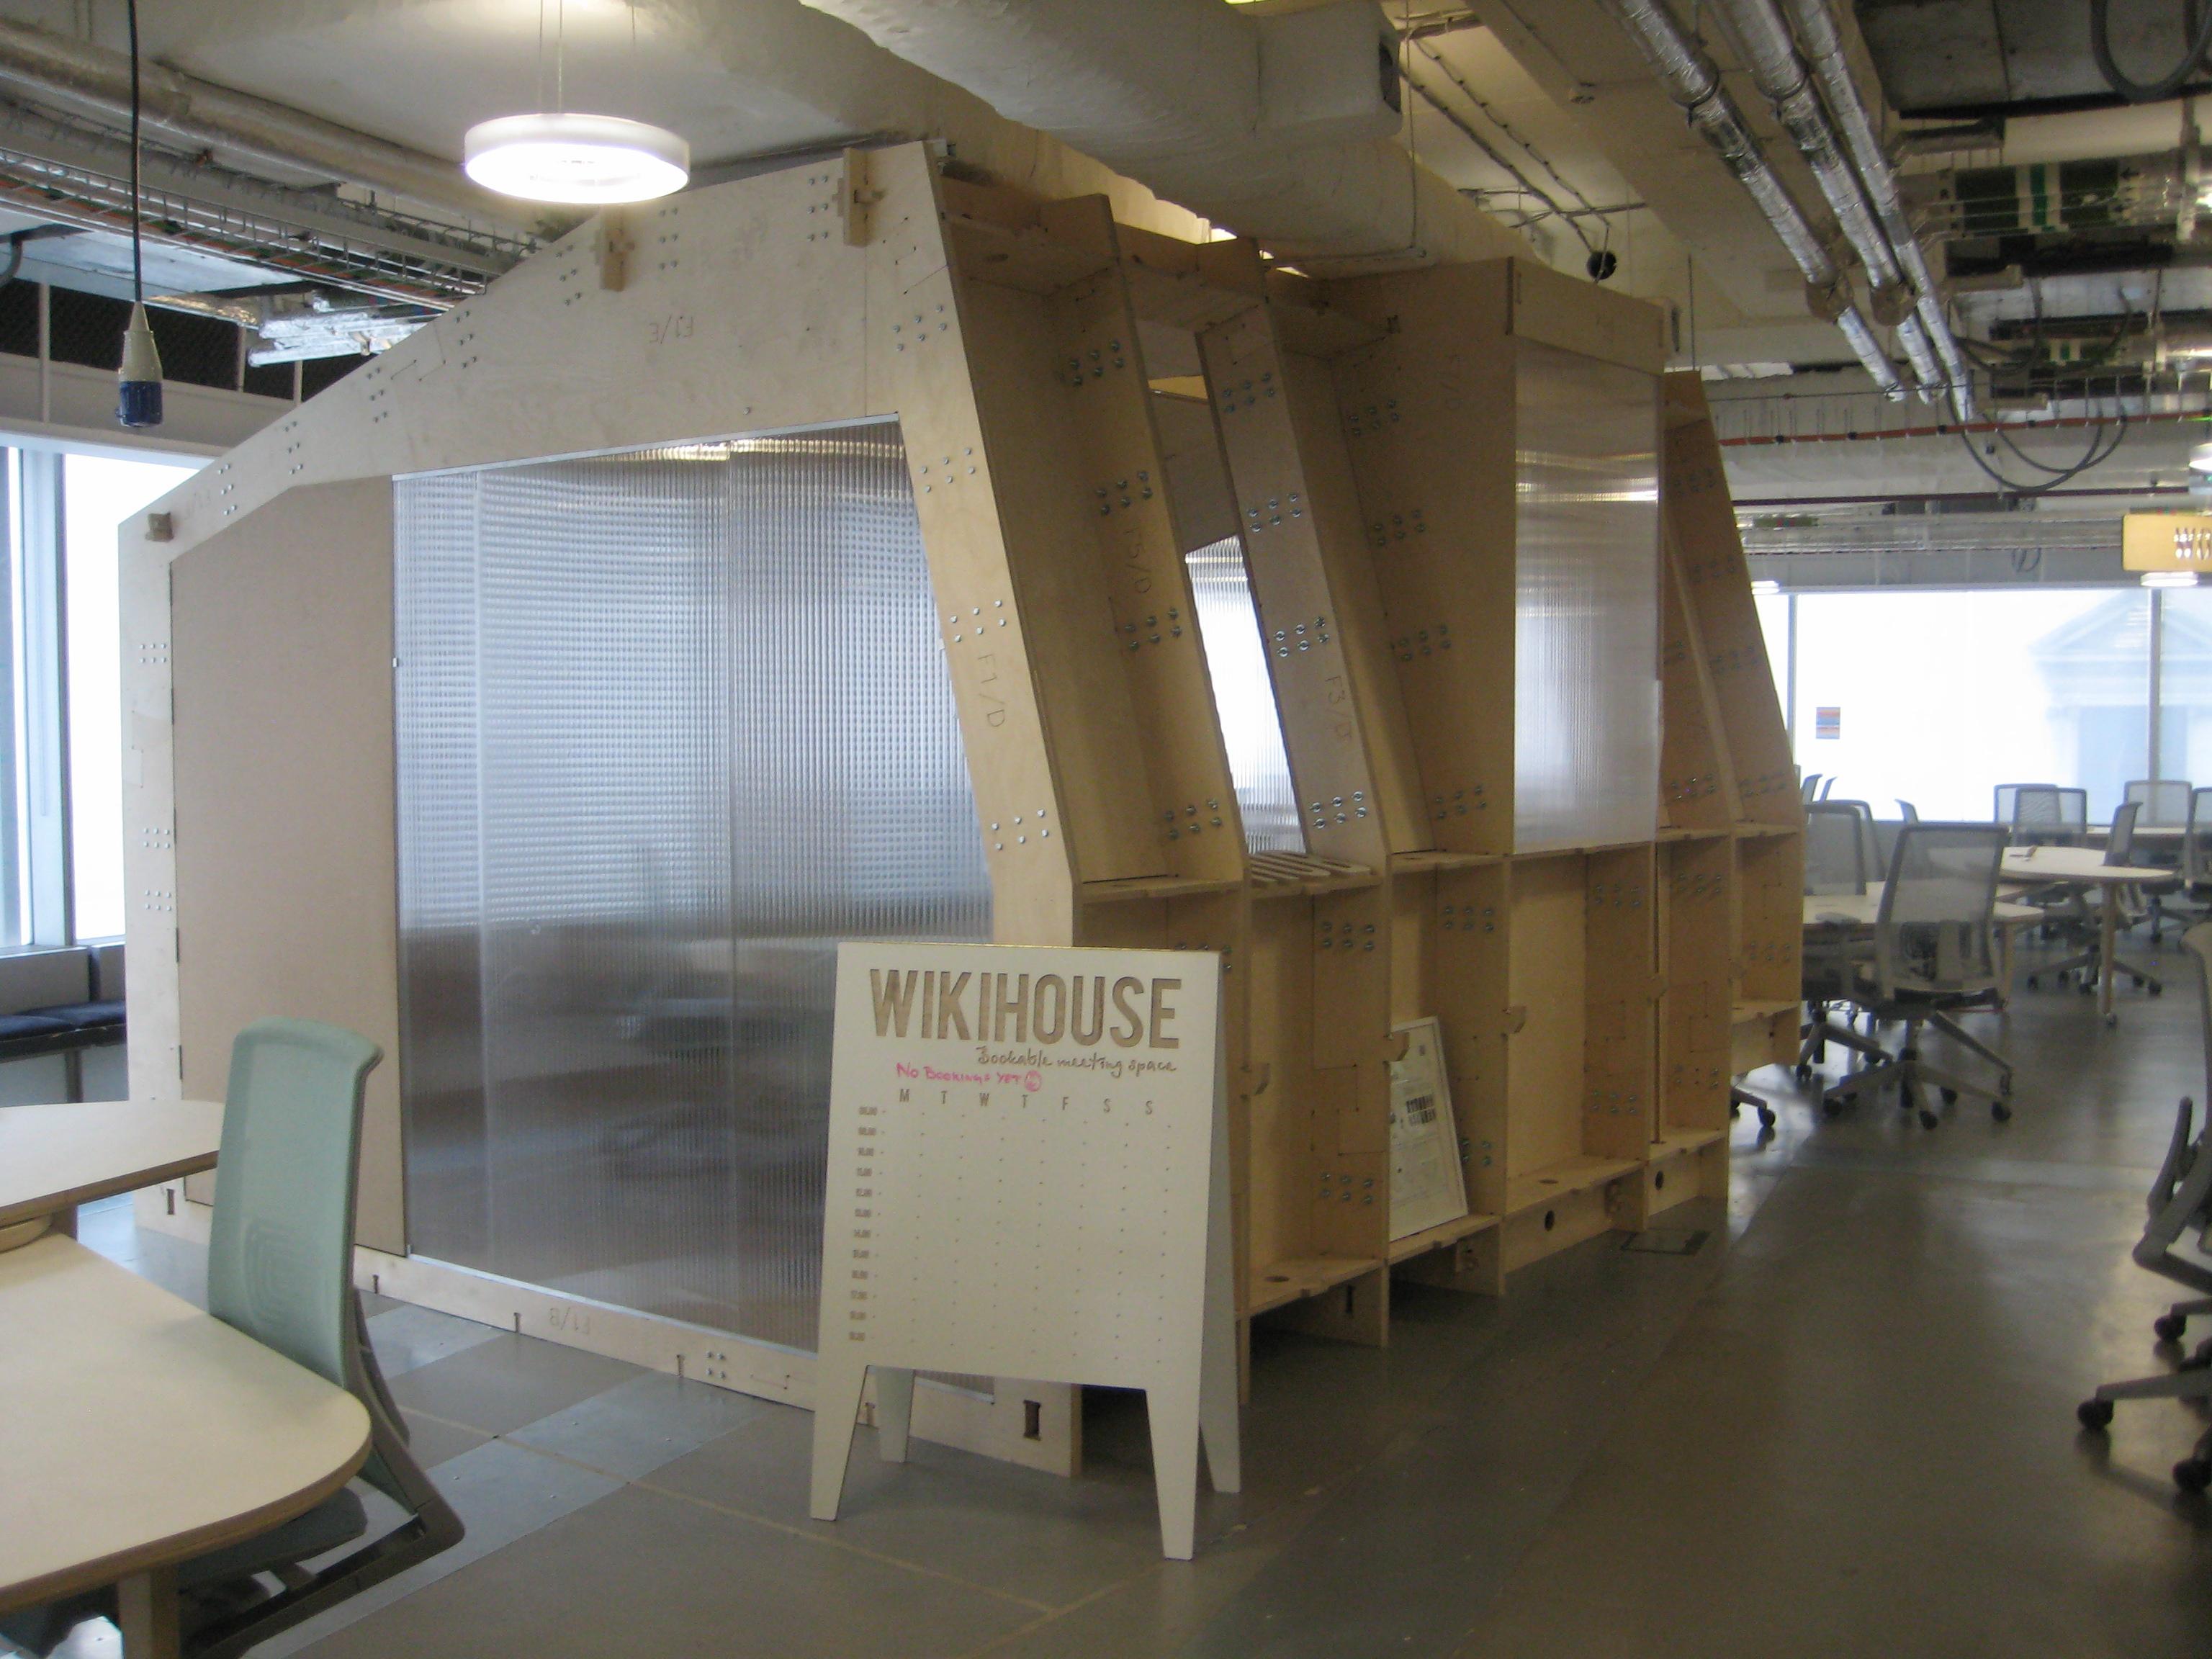 WikiHouse - Wikipedia